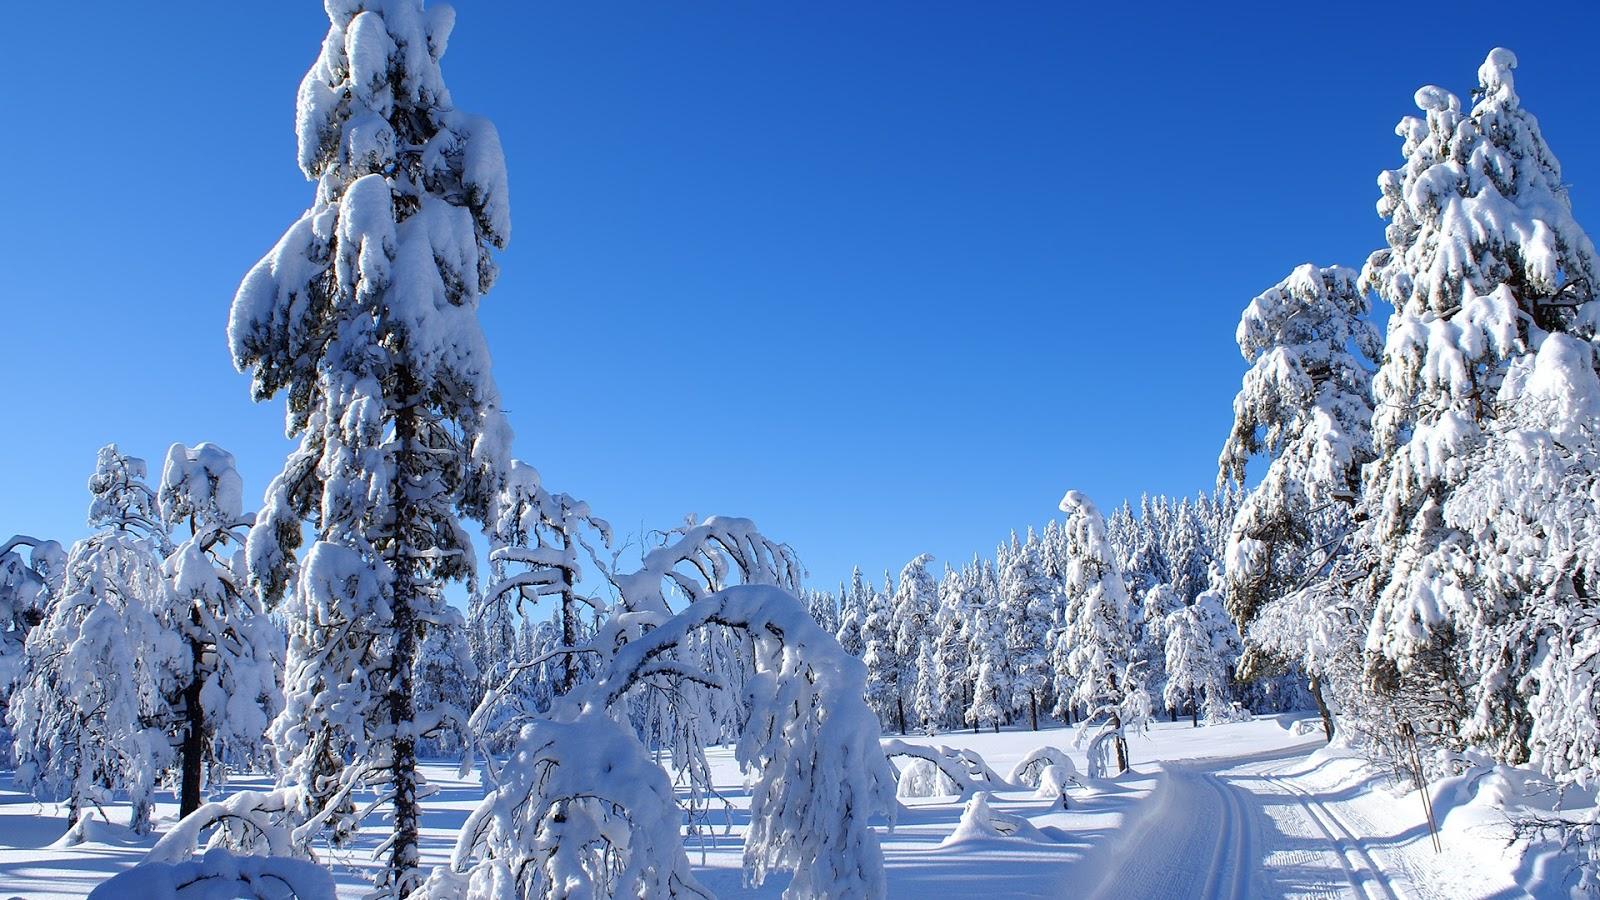 Beautiful Winter Wallpapers Beauty of Winter season Nature 1600x900